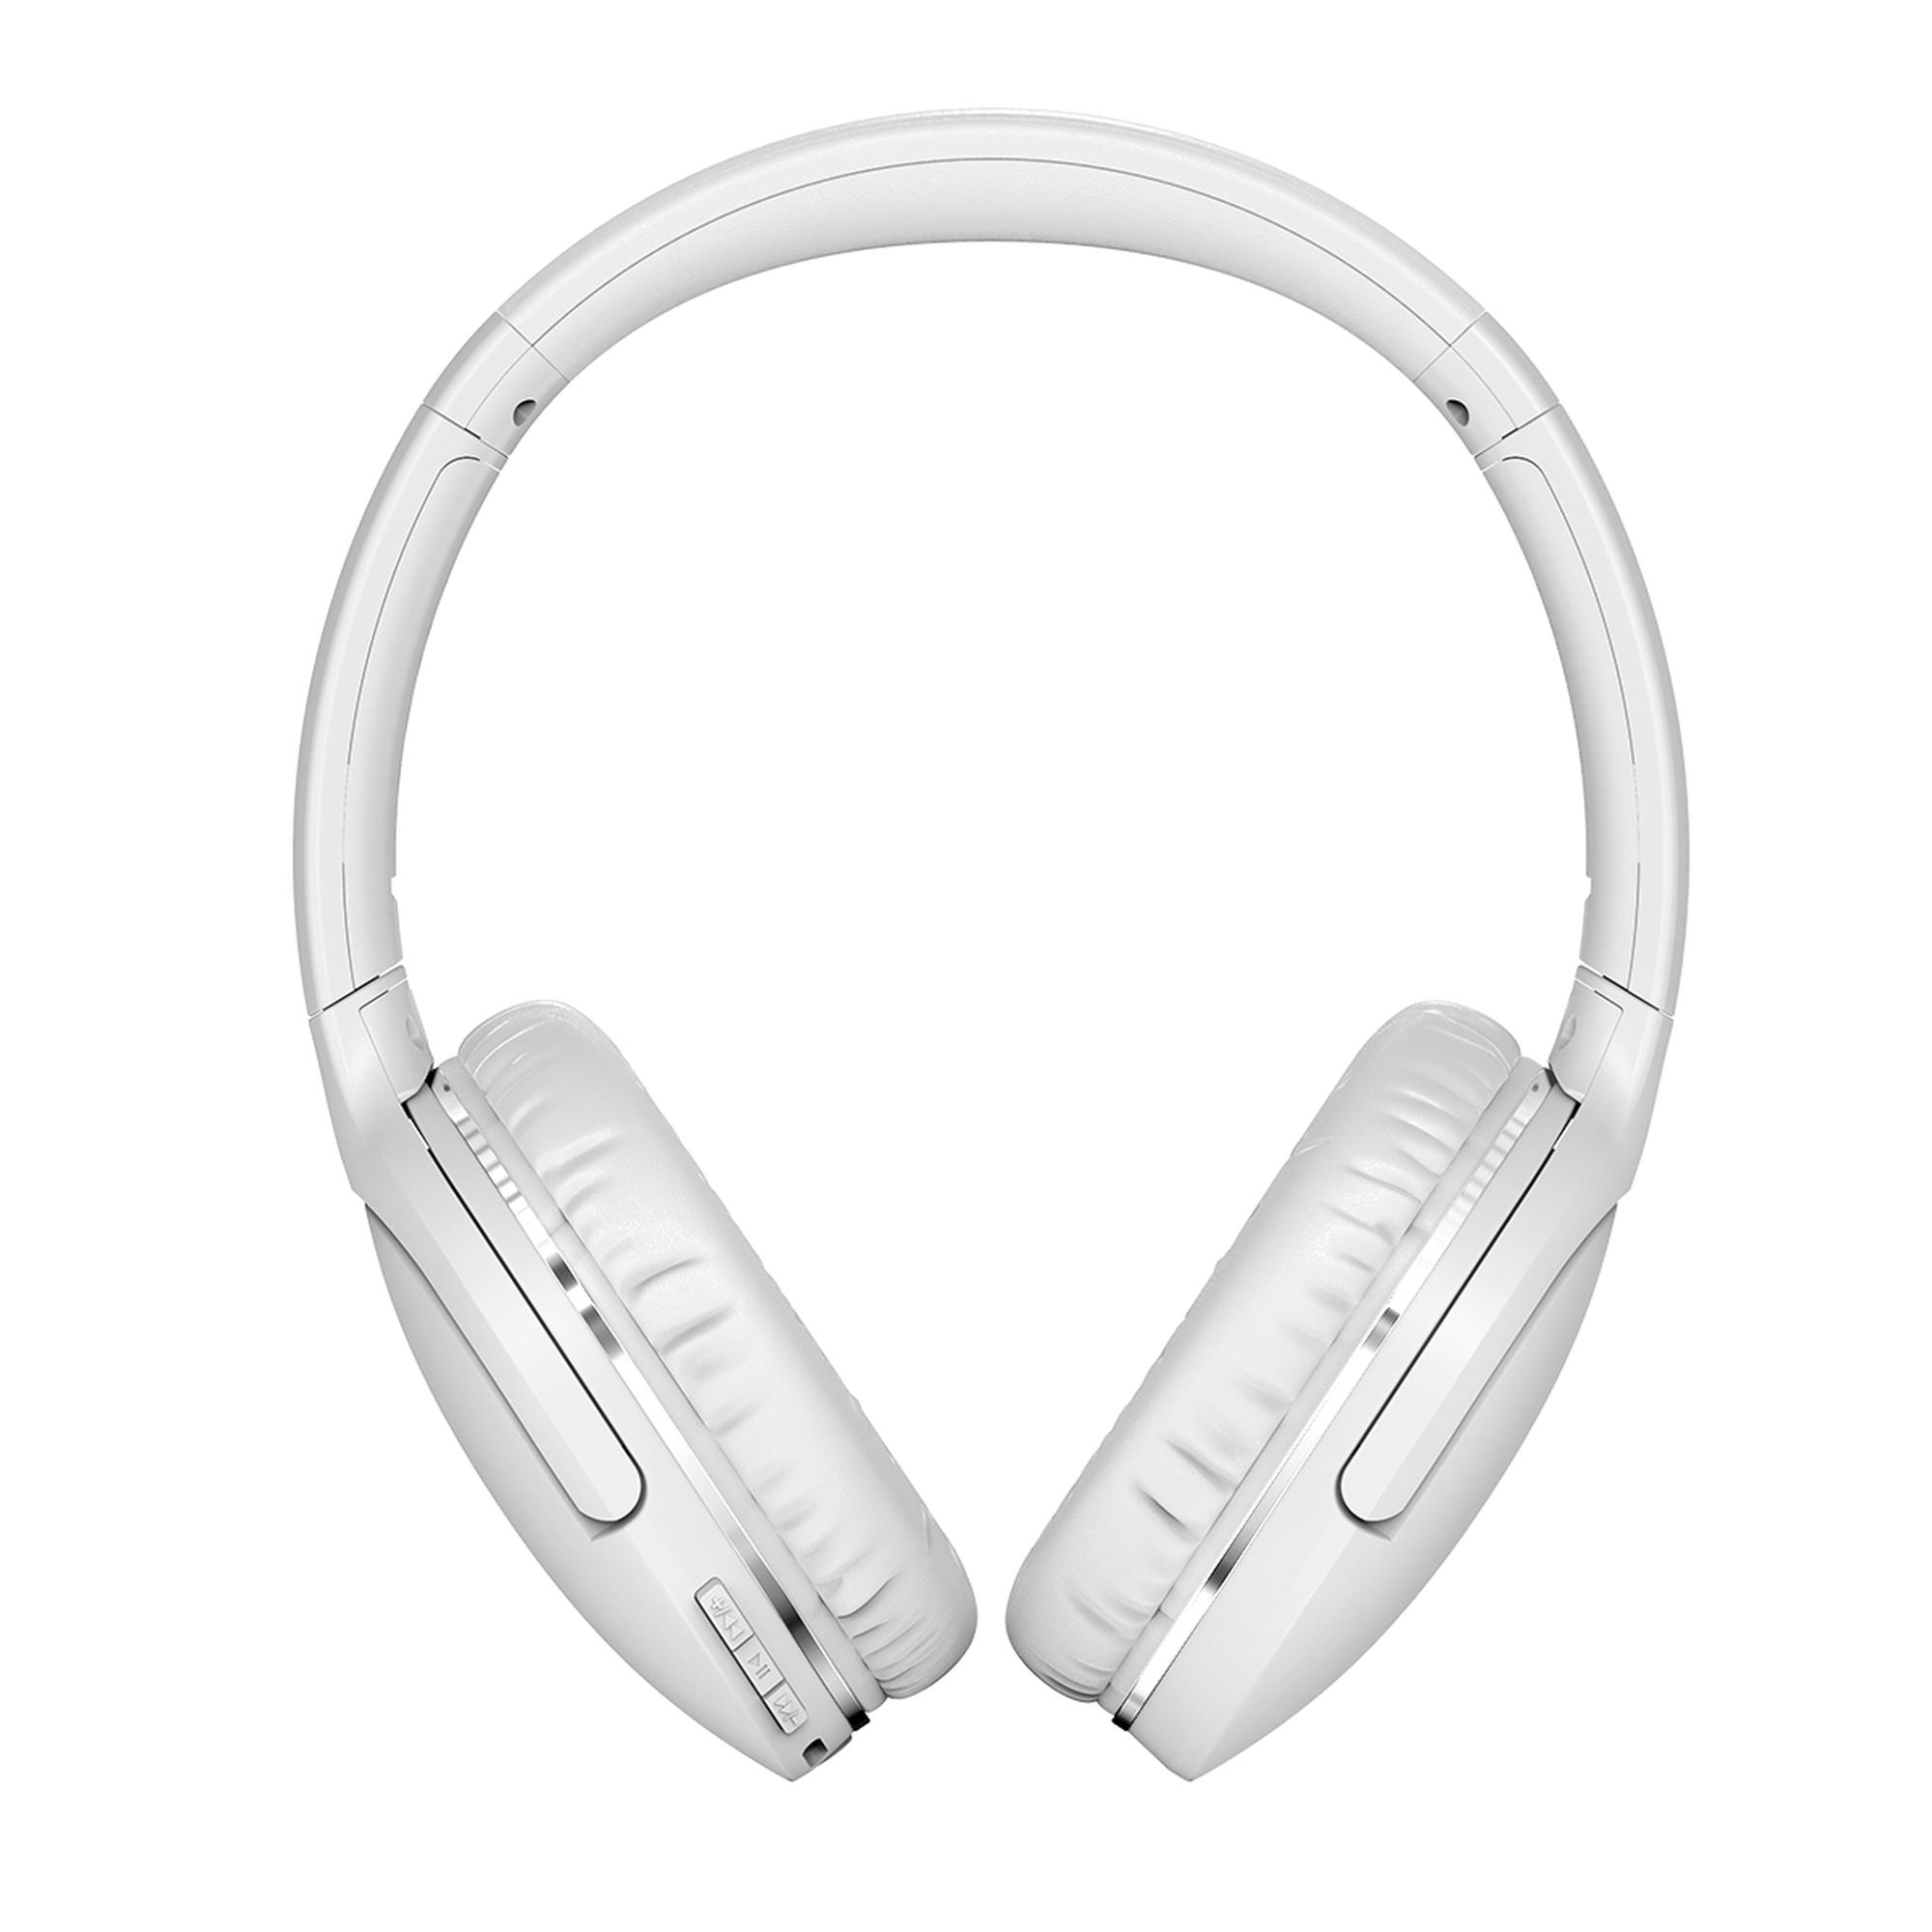 Baseus Wireless Headphones Encok D02 Pro White